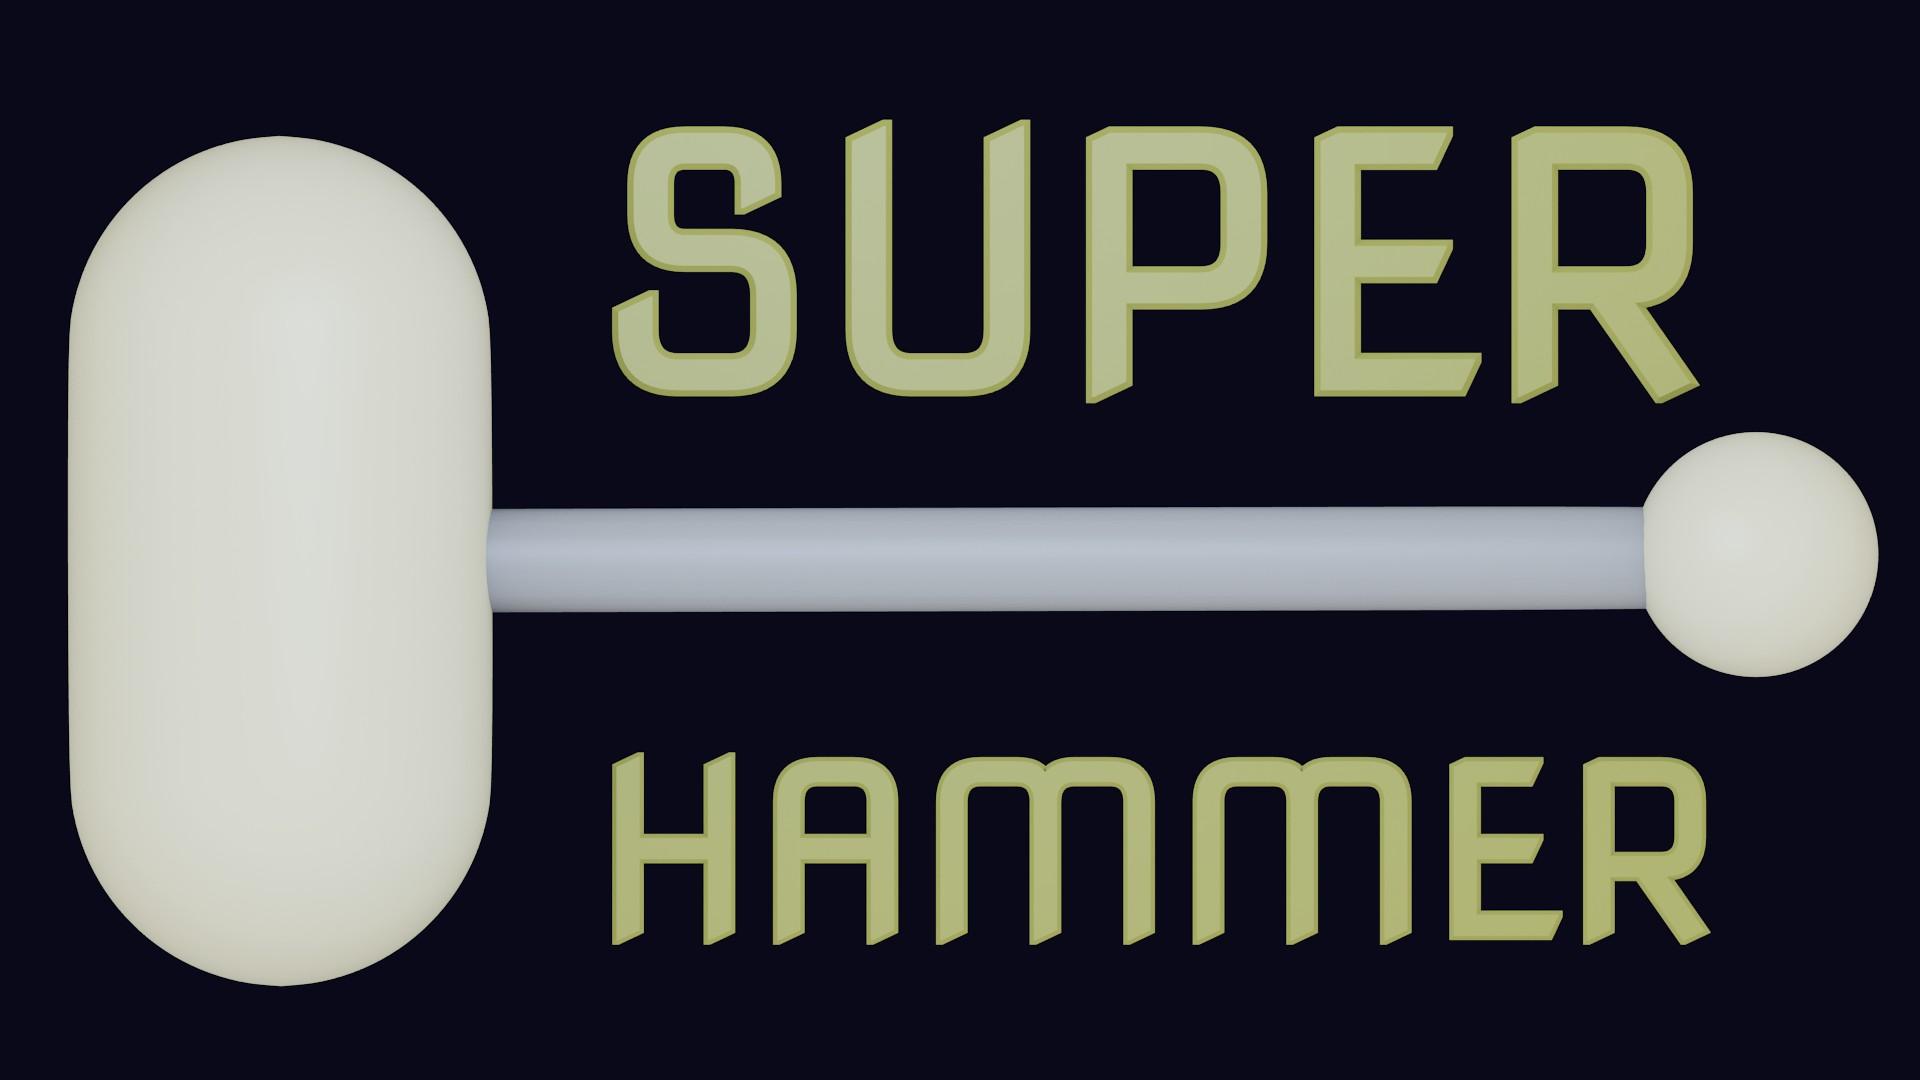 Super Hammer splash screen